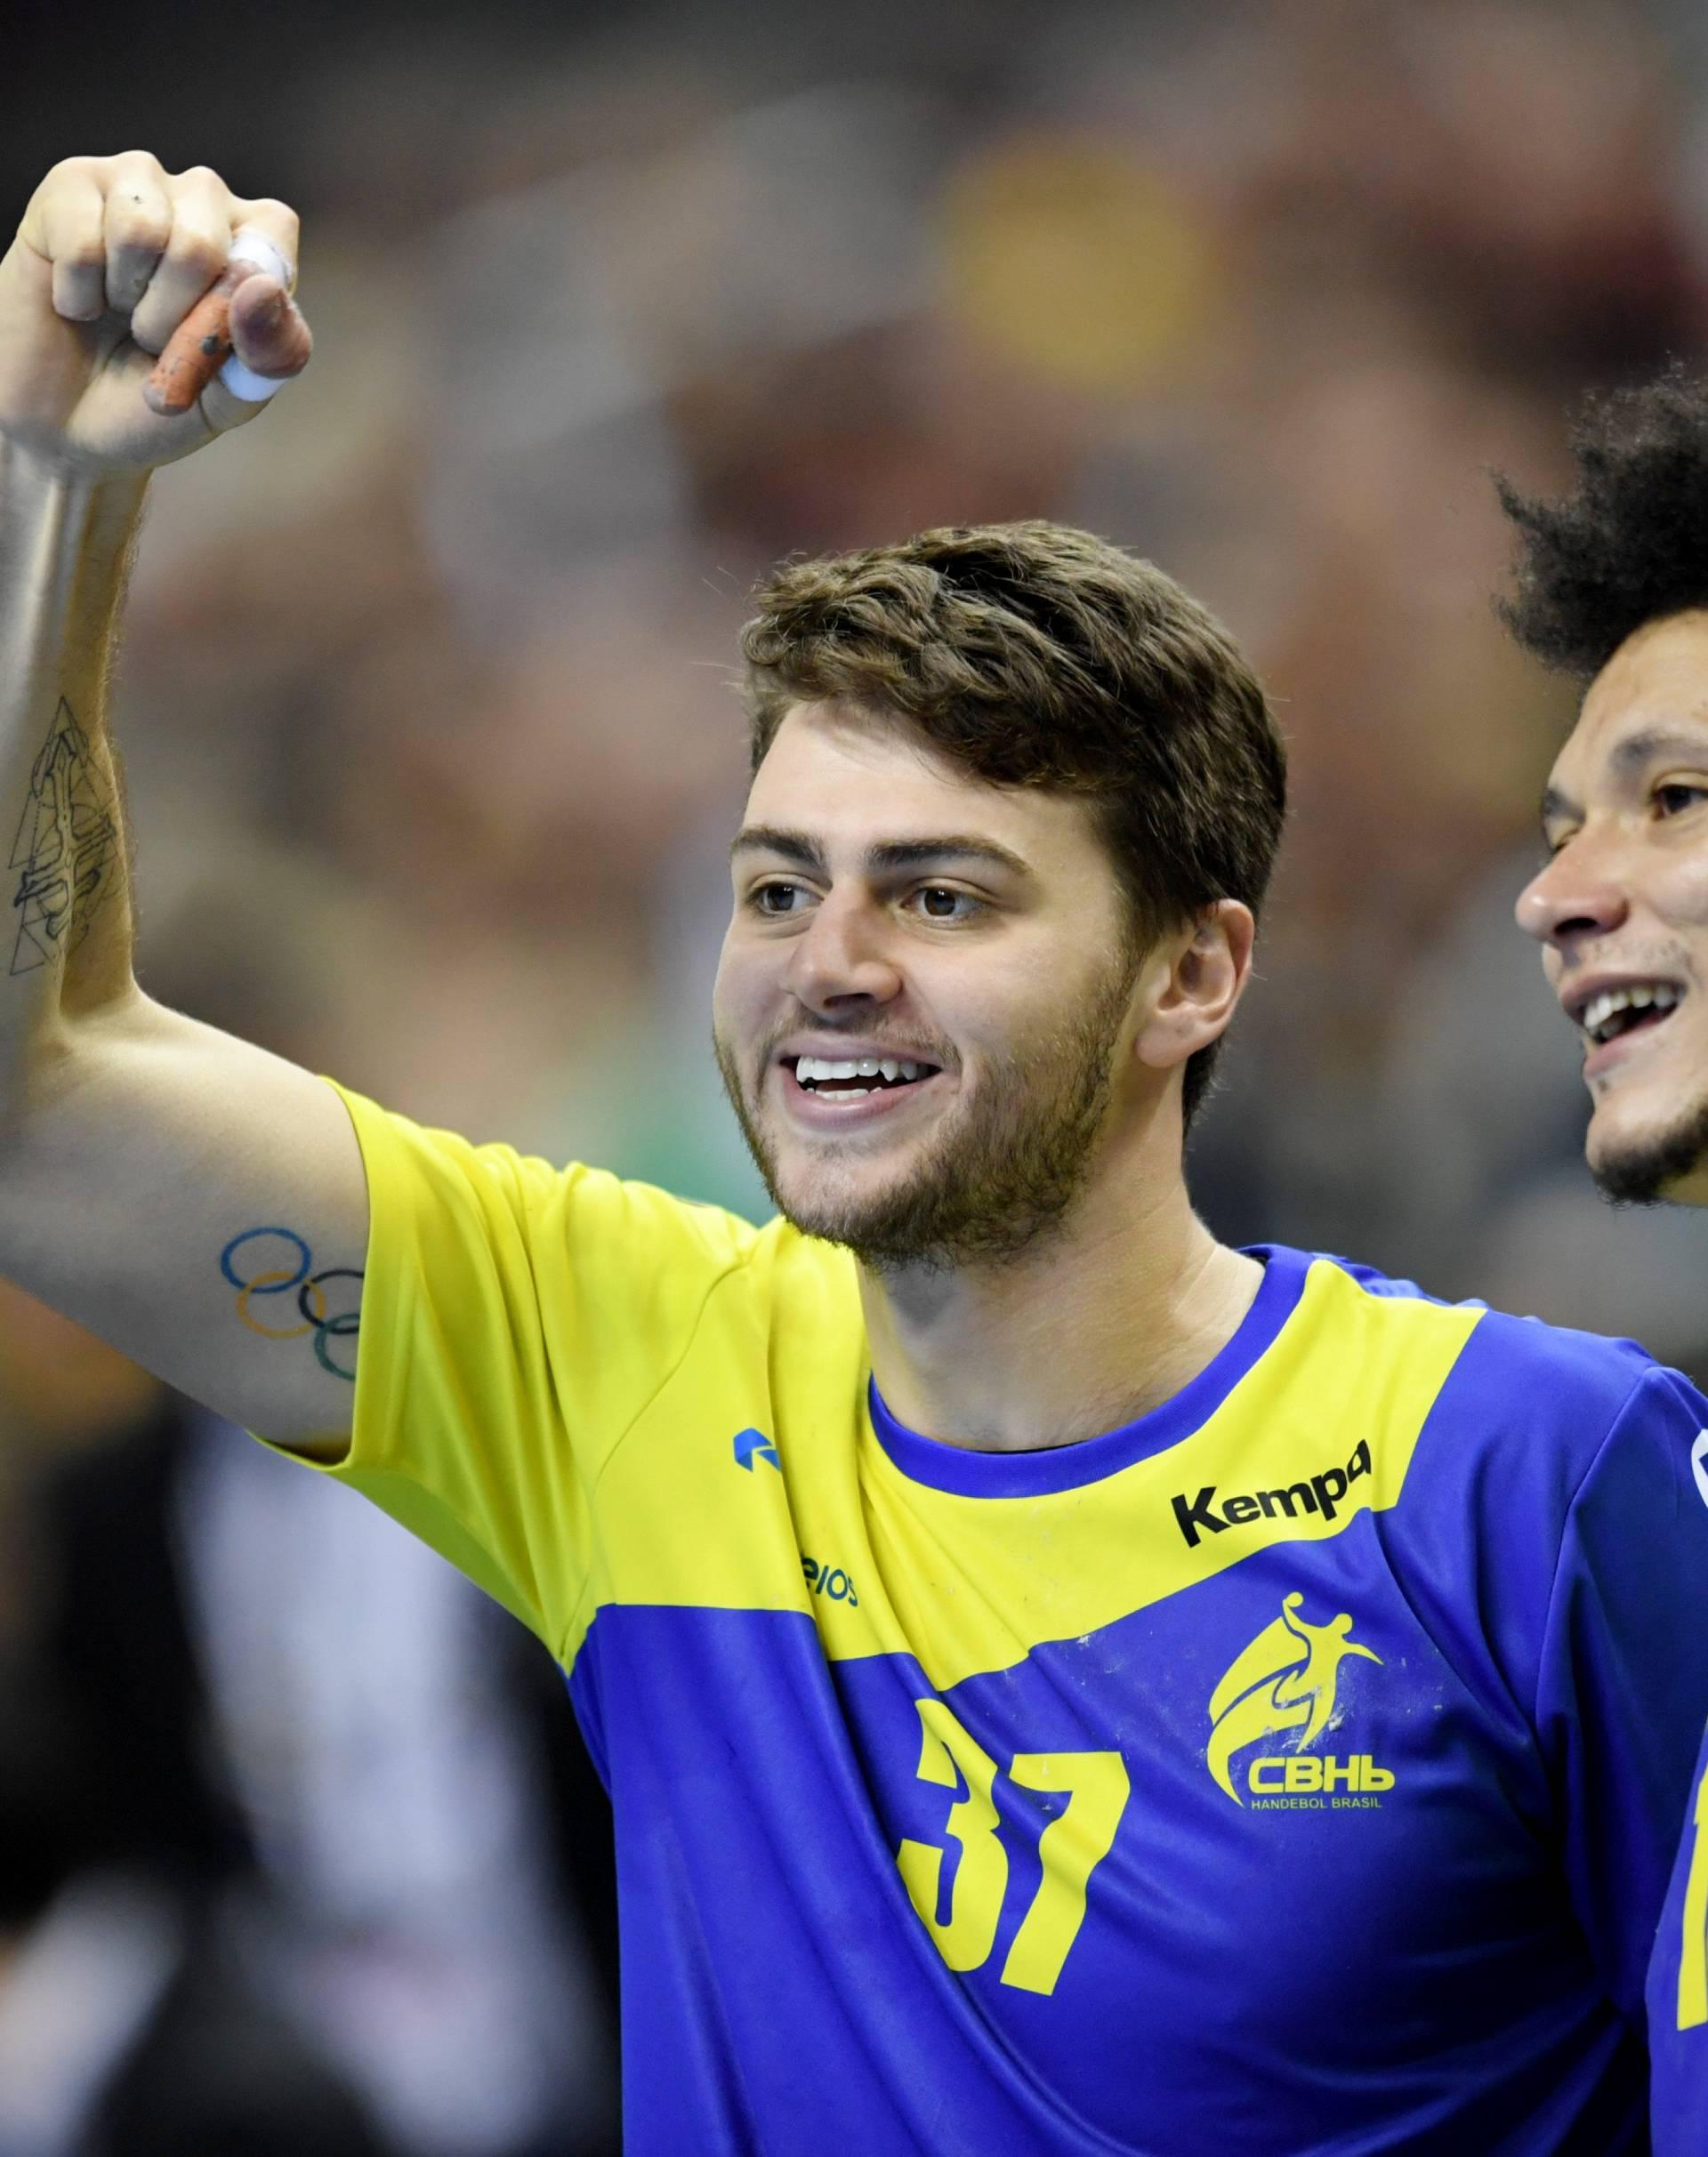 IHF Handball World Championship - Germany & Denmark 2019 - Group A - Brazil v Korea